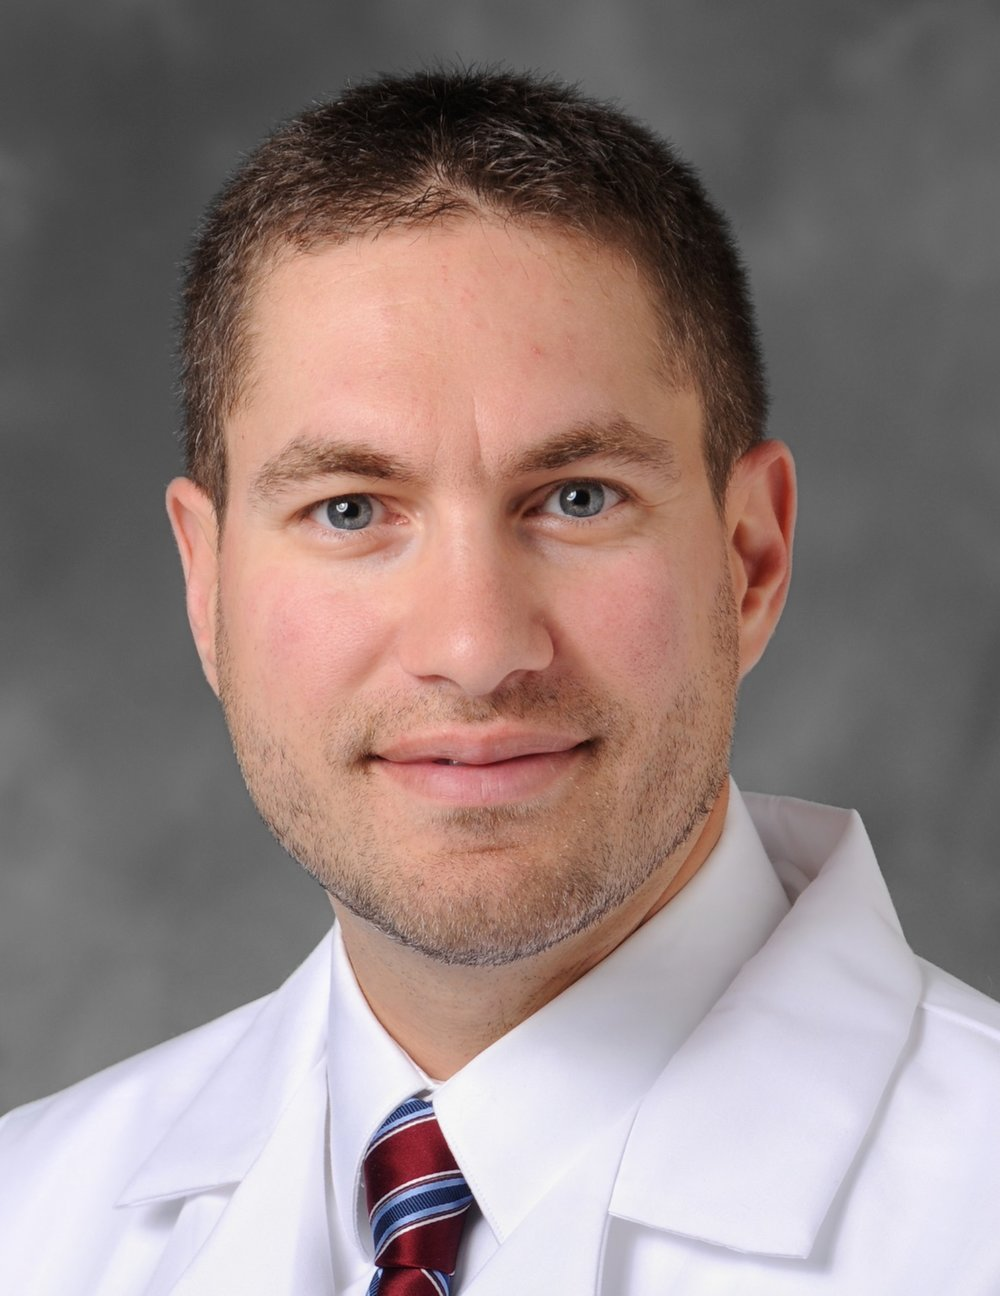 Clinical Assistant Professor Stanford University School of Medicine  Medical Director, Radiology Informatics Lucile Packard Children's Hospital at Stanford